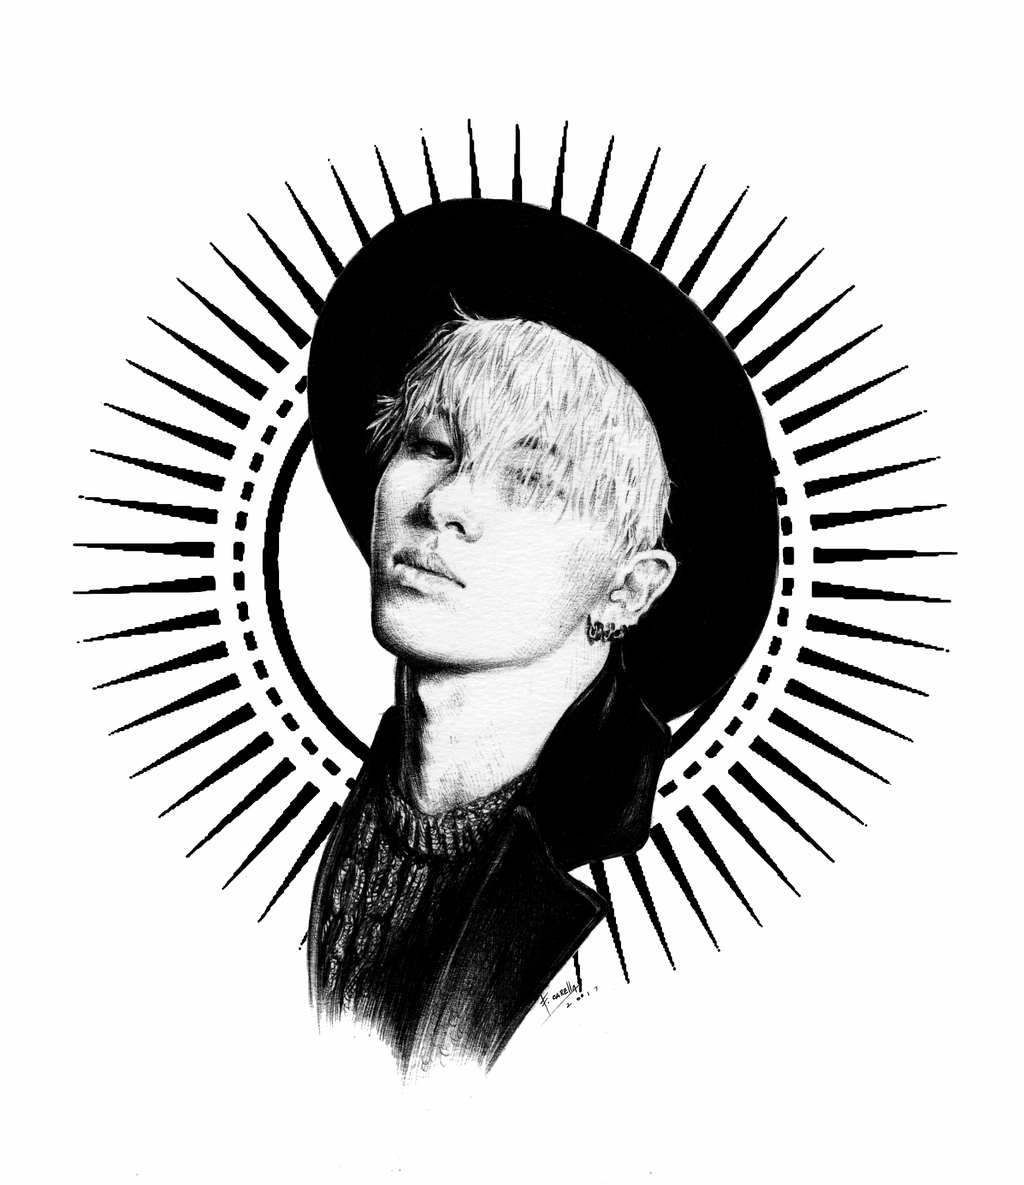 TAEYEON  I feat Verbal Jint HANROMENG Lyrics  YouTube